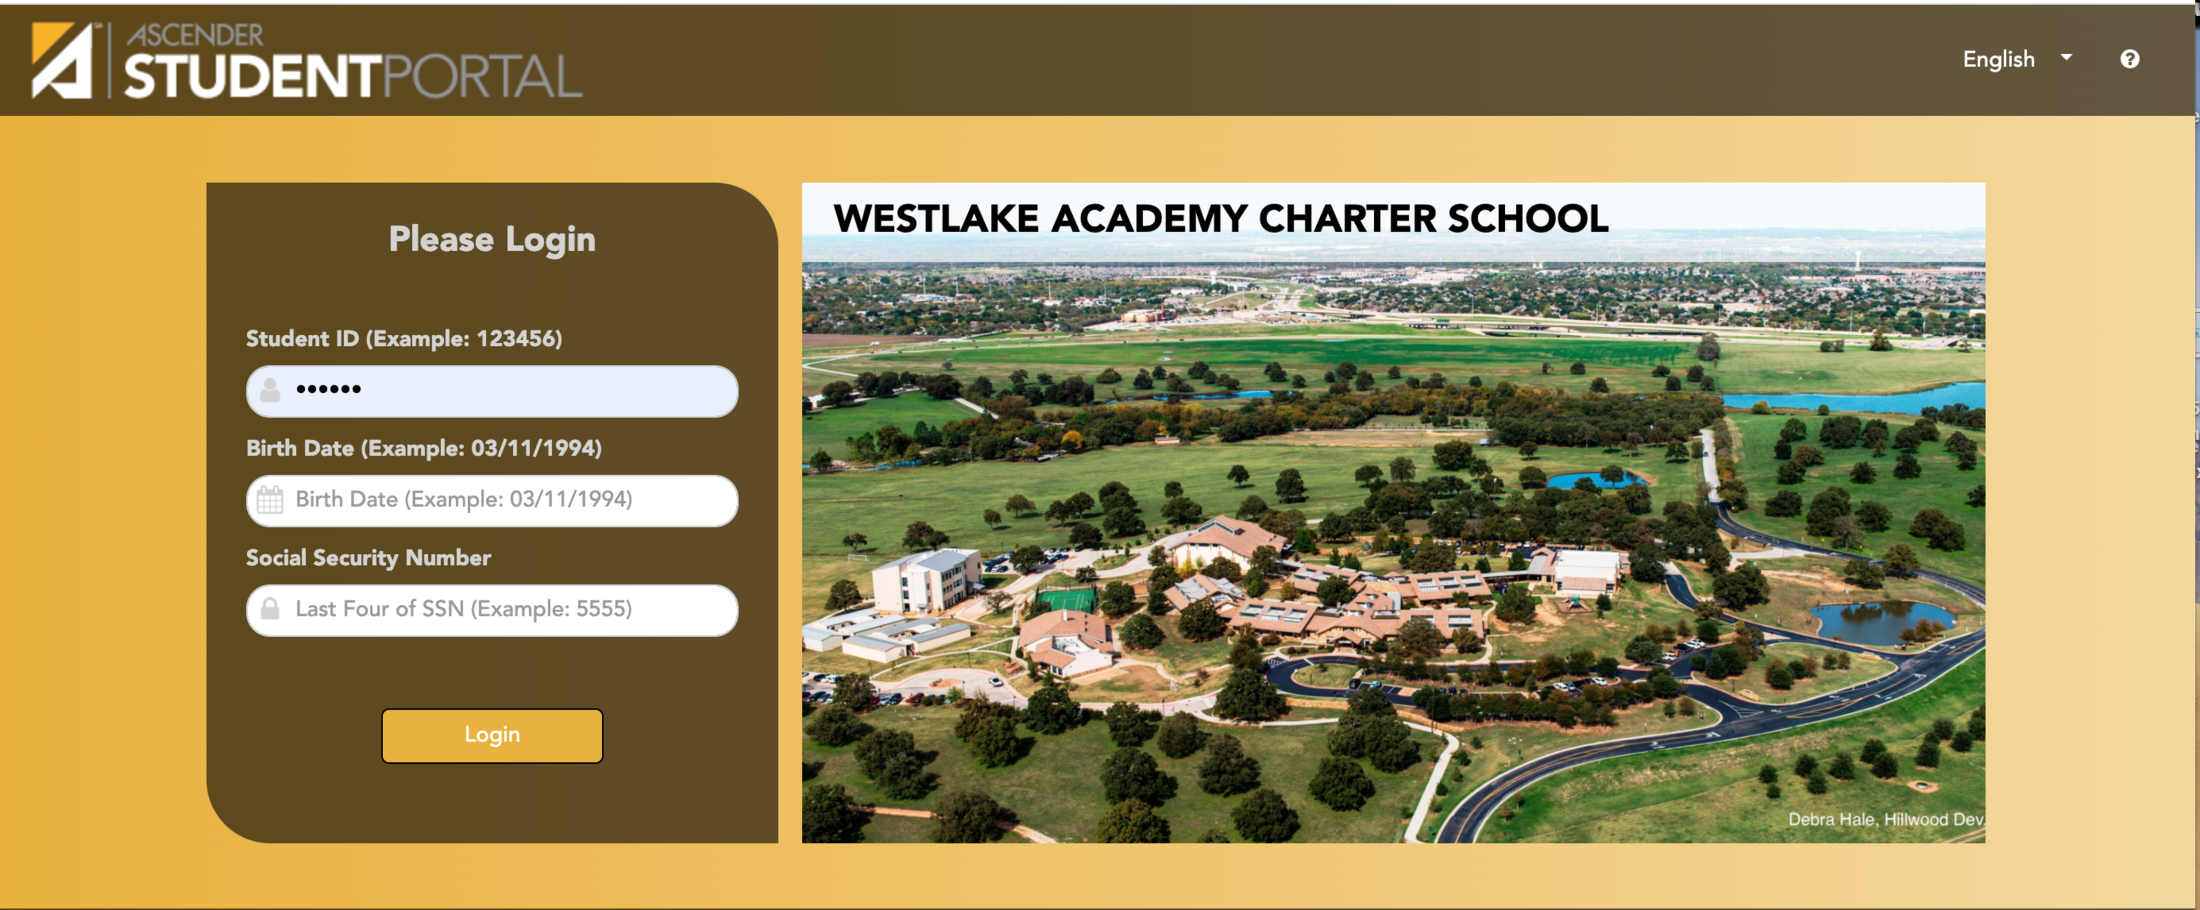 Ascender Formerly Txconnect Student Portal Westlake Academy Charter School